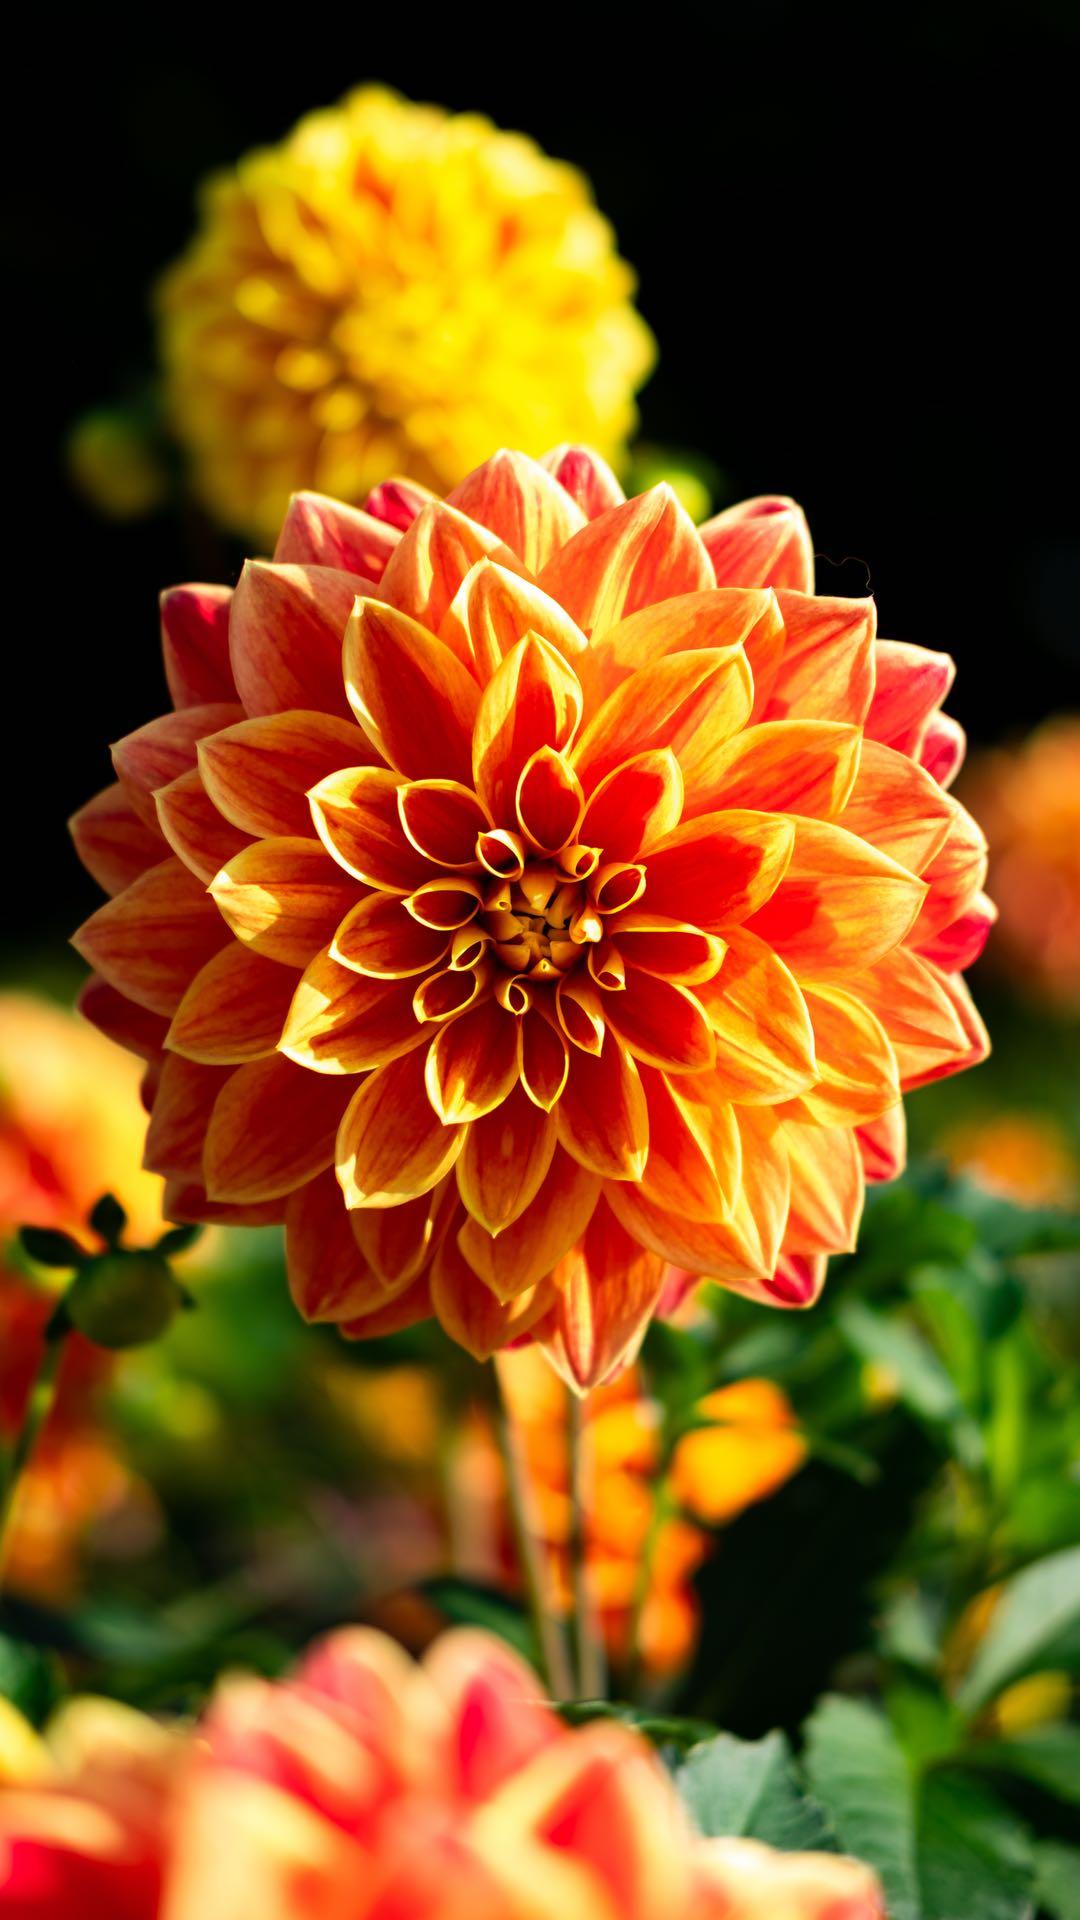 Natural Symmetry 1080x1920